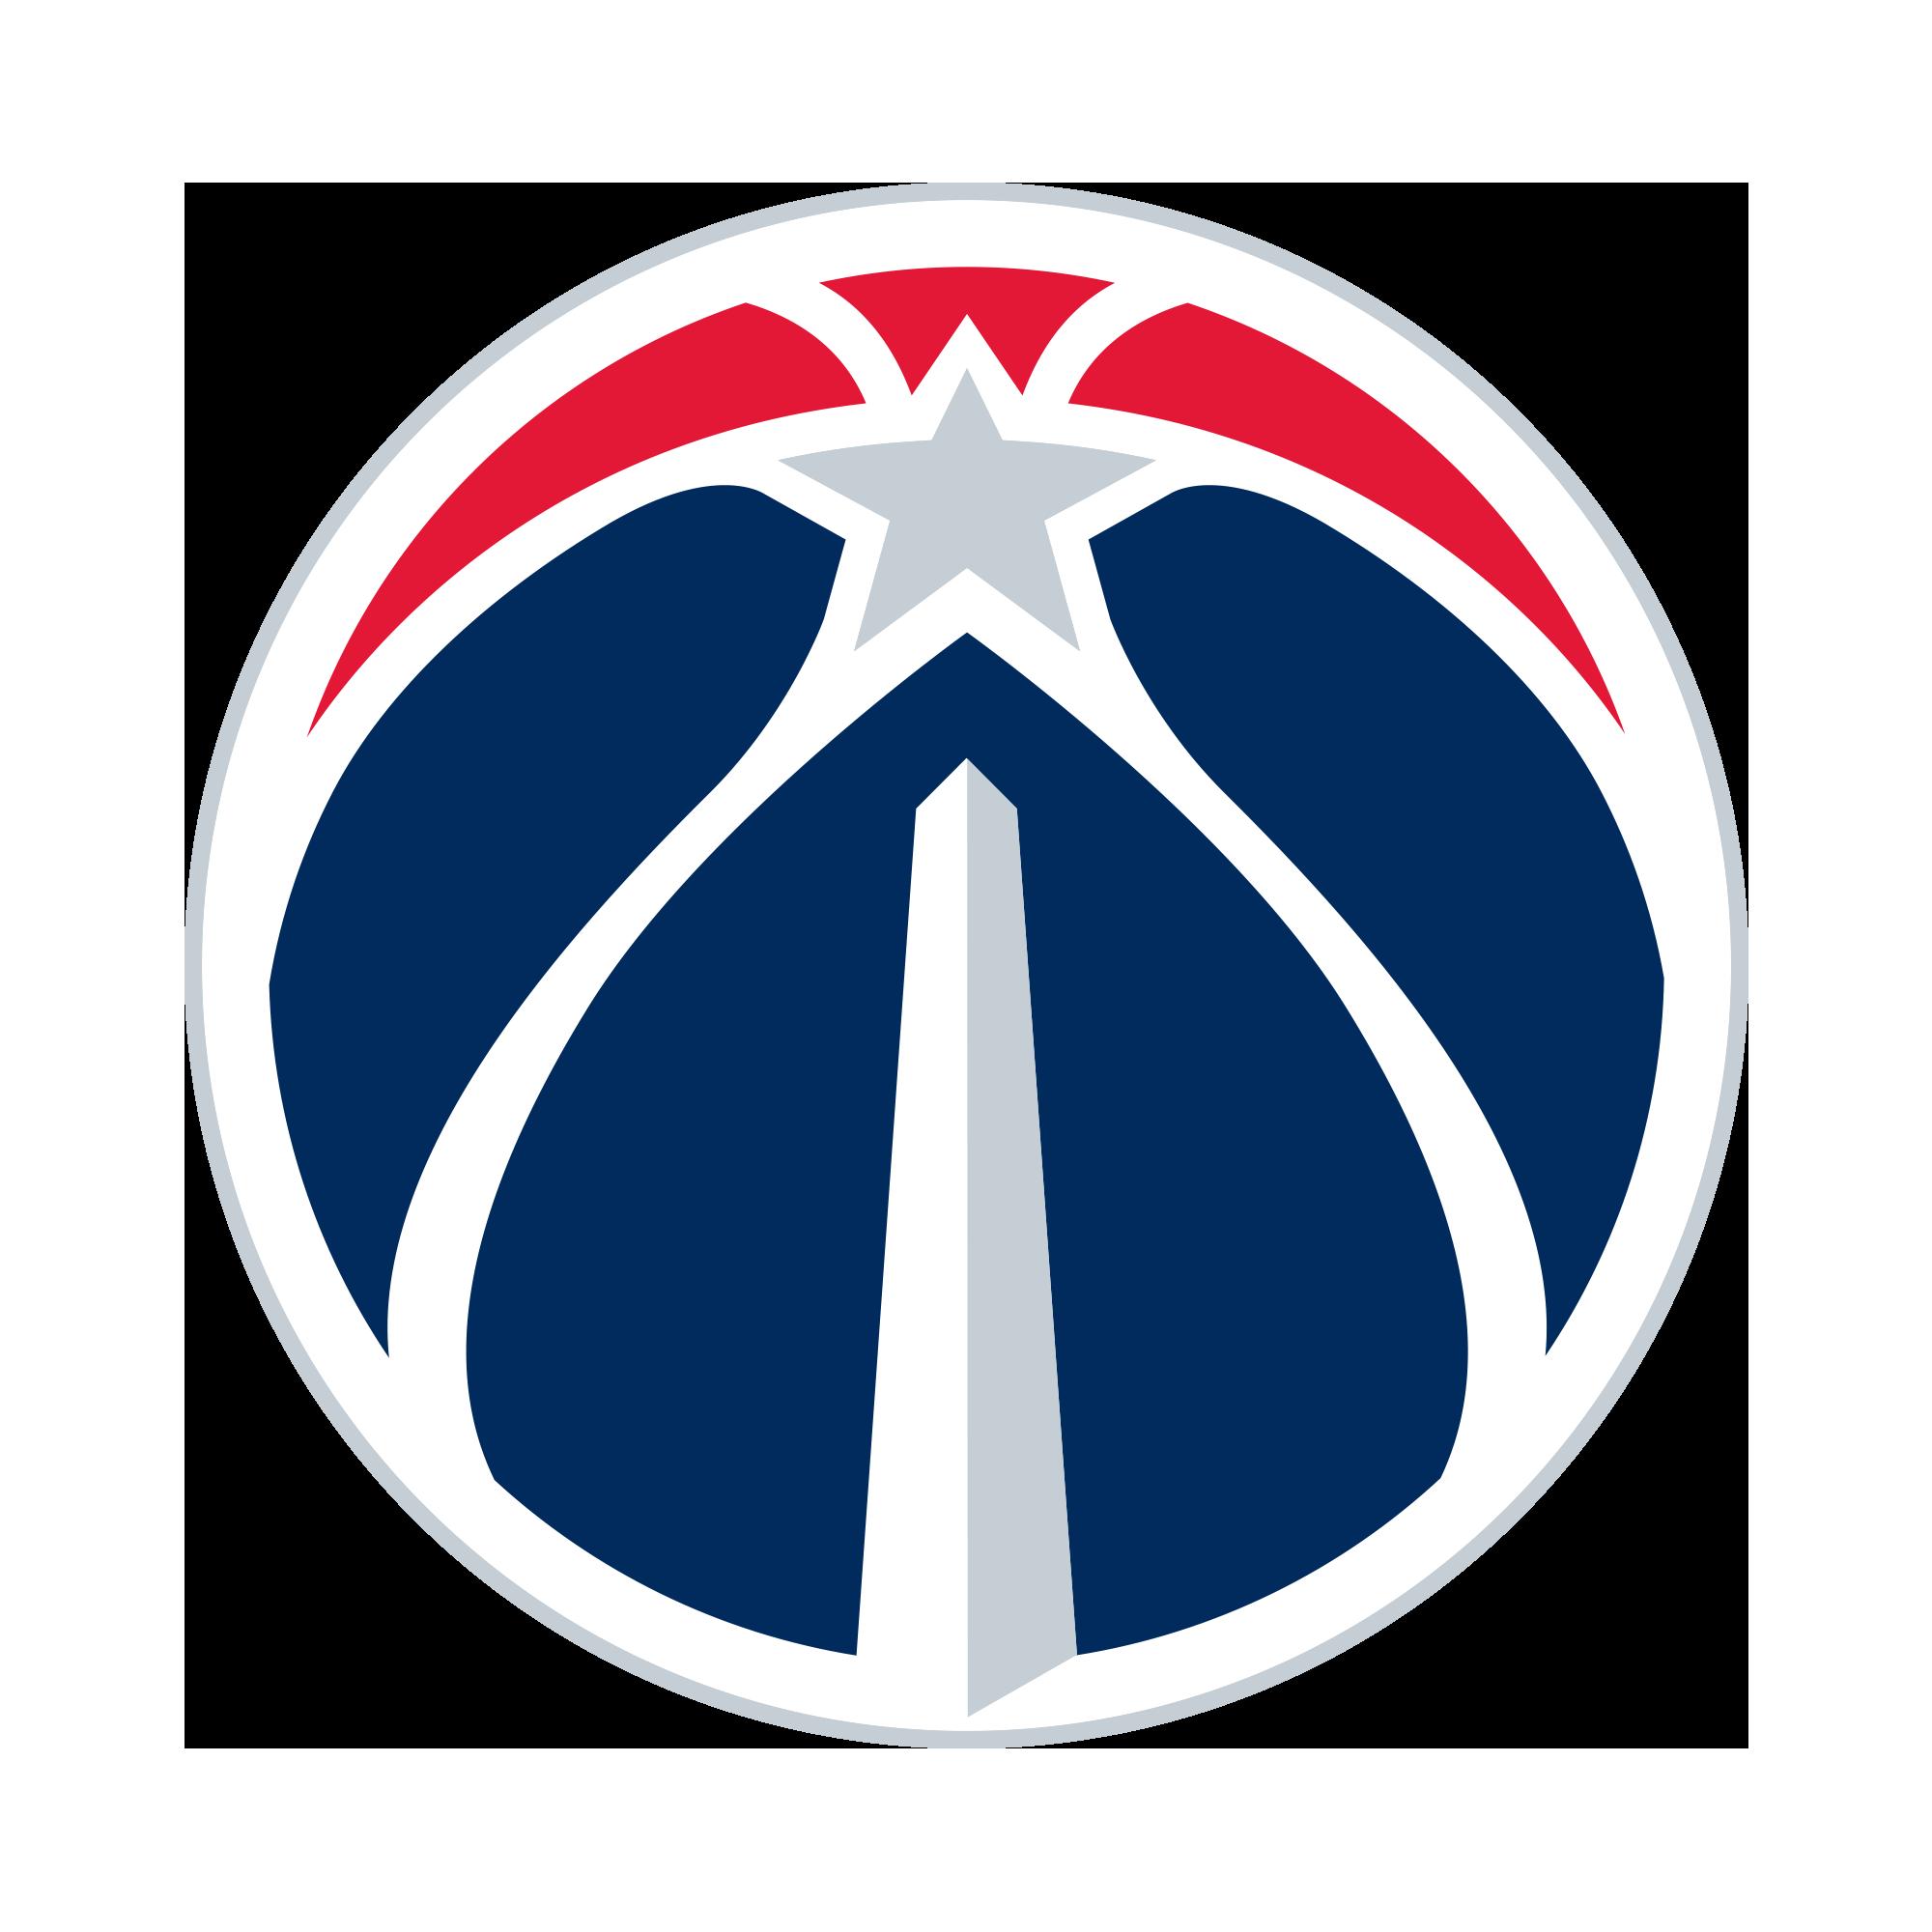 Clippers claim top spot in nba power rankings article tsn washington wizards biocorpaavc Choice Image